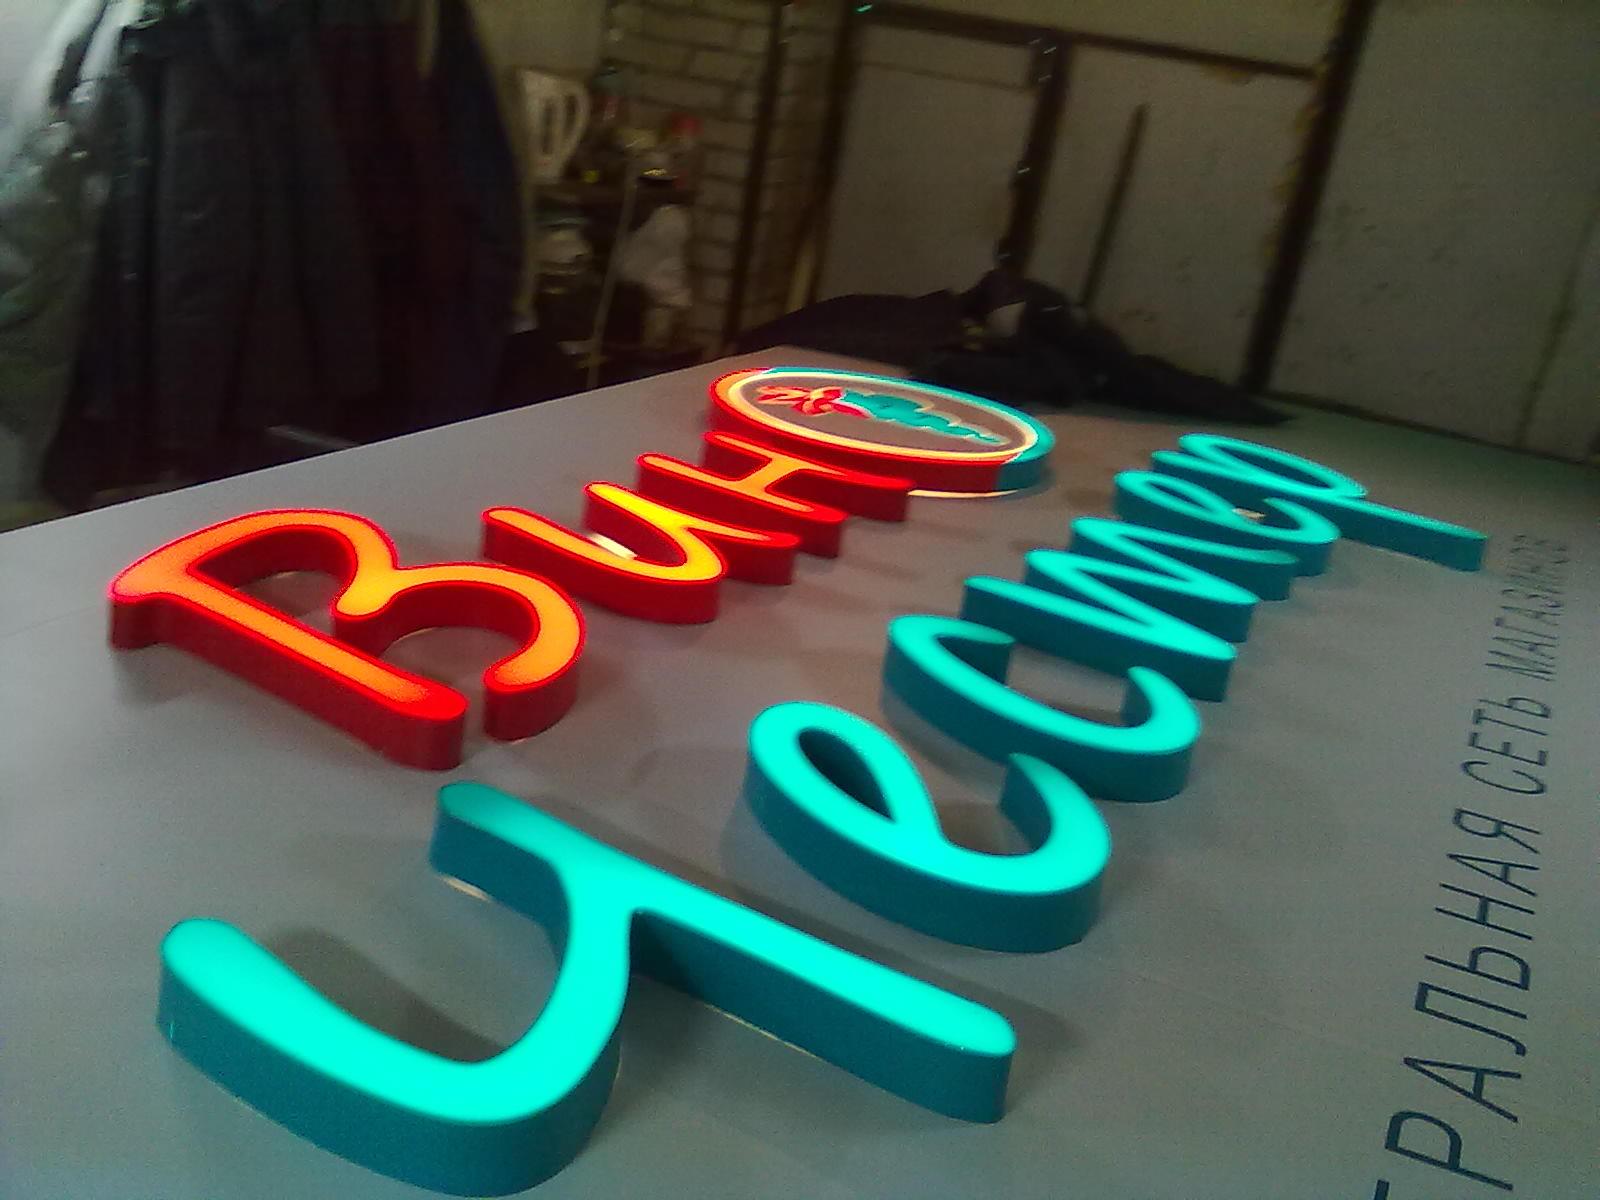 Вывески, световые объемные буквы, наружная реклама